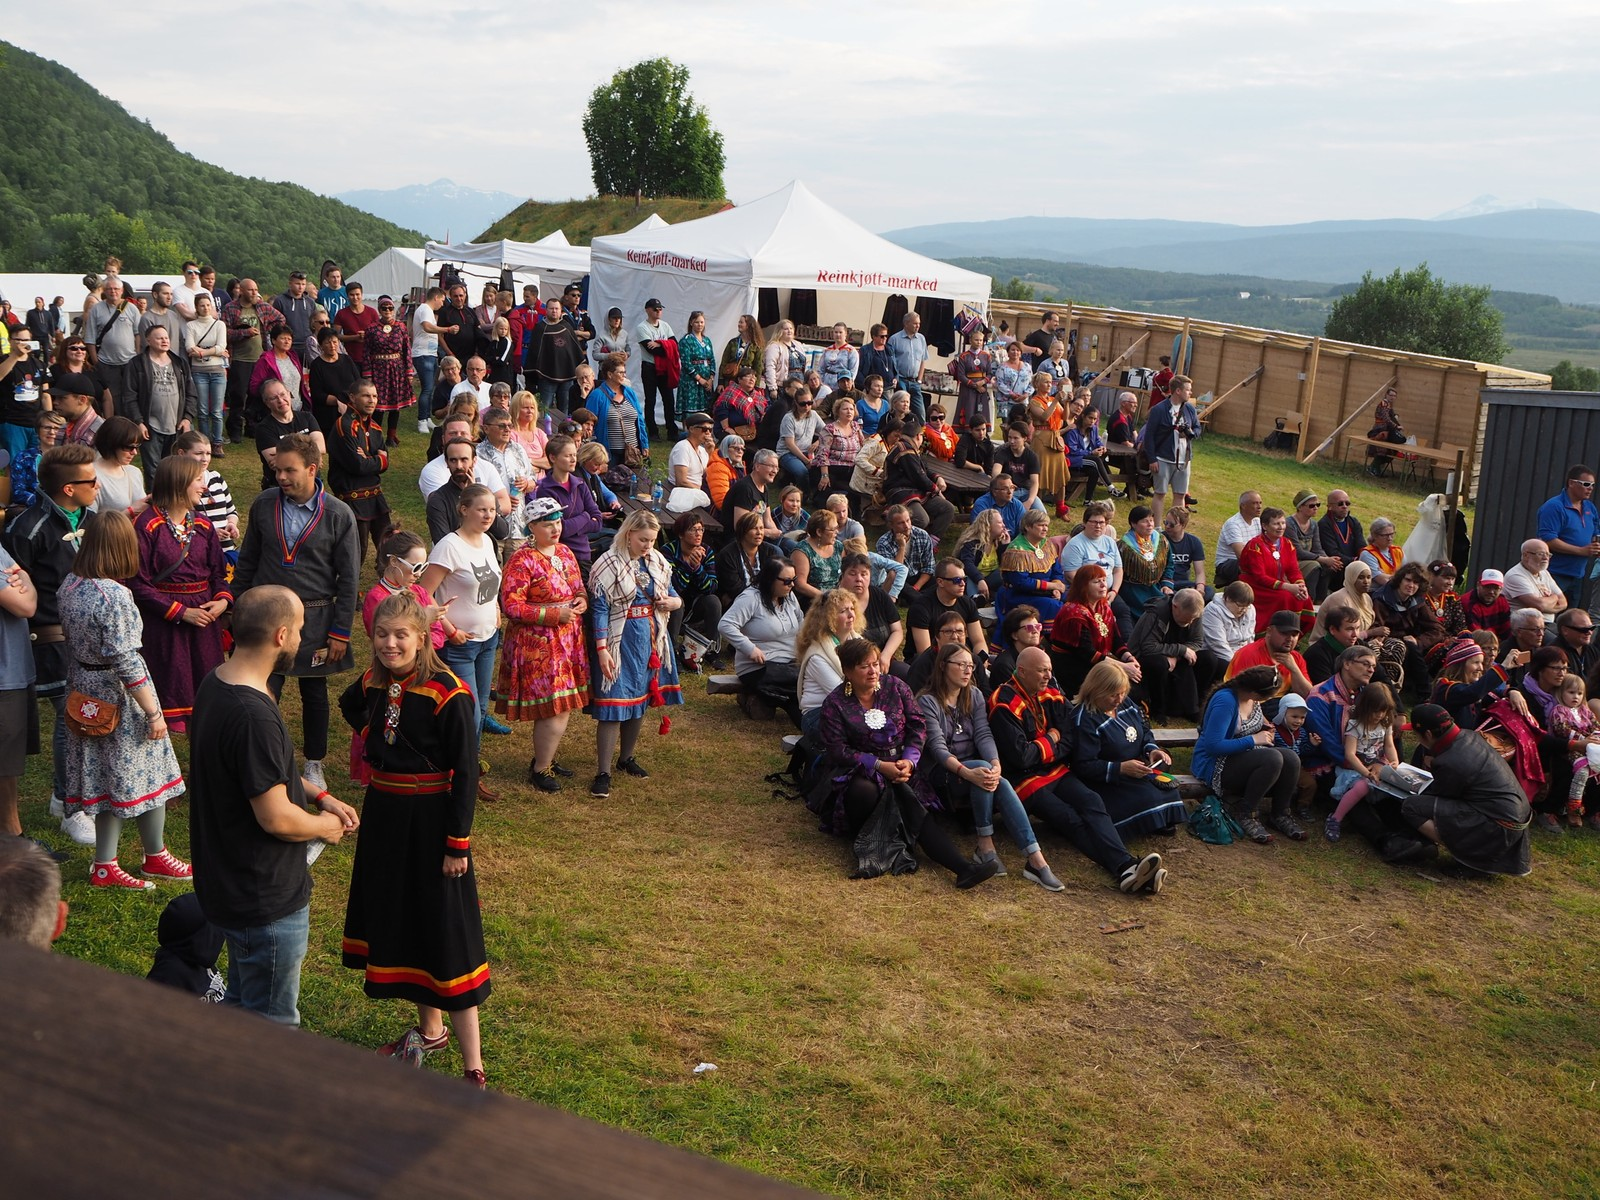 Mange mennesker var tilstede for å høre på Tanabreddens Ungdom.V